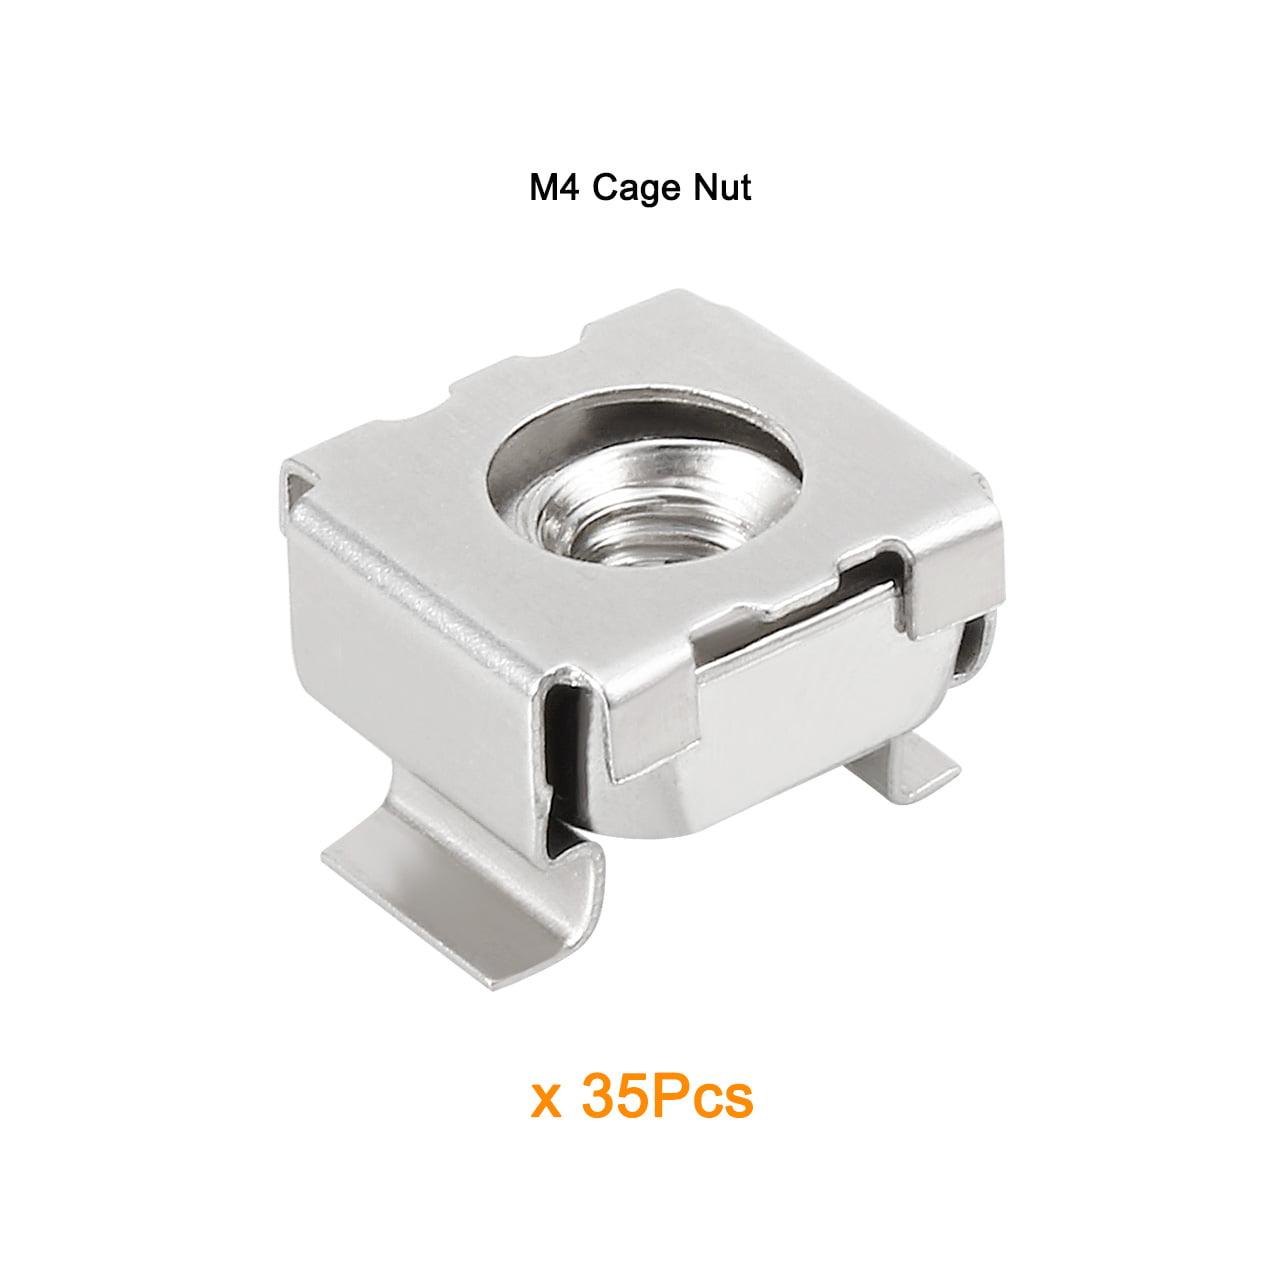 Unique Bargains 35pcs Carbon Steel Nickel Plated M4 Cage Nut for Server Shelf Cabinet - image 1 de 4